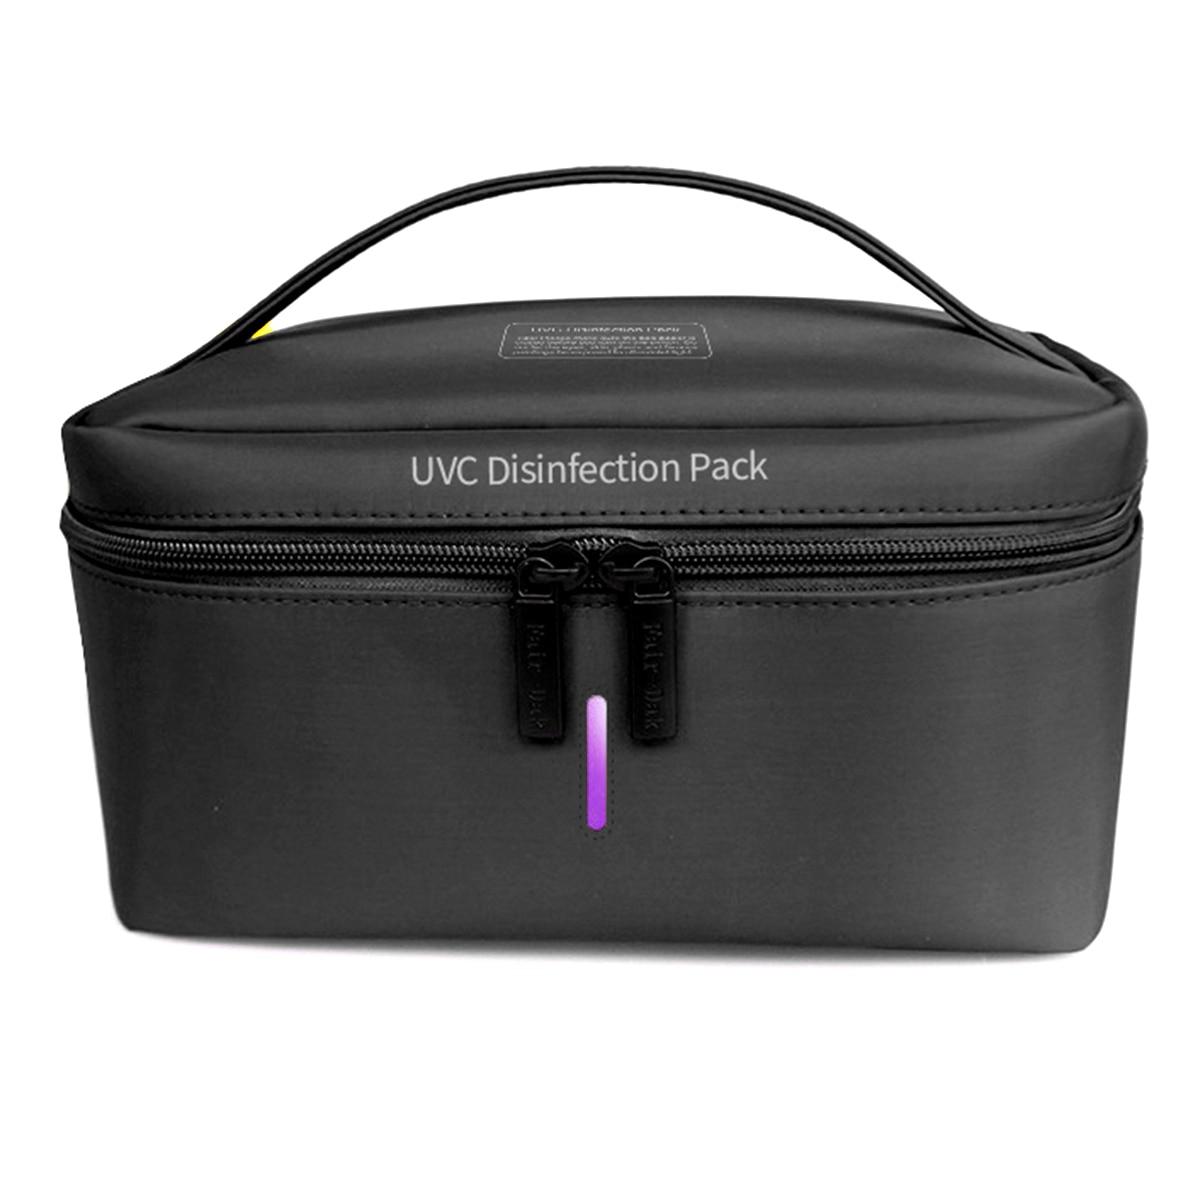 Portable UV Sterilizer Bag Uvc Disinfect Pack Clothes Sterilization Bag Phone Mask Sterilizer Box LED UVC Disinfection Lamp